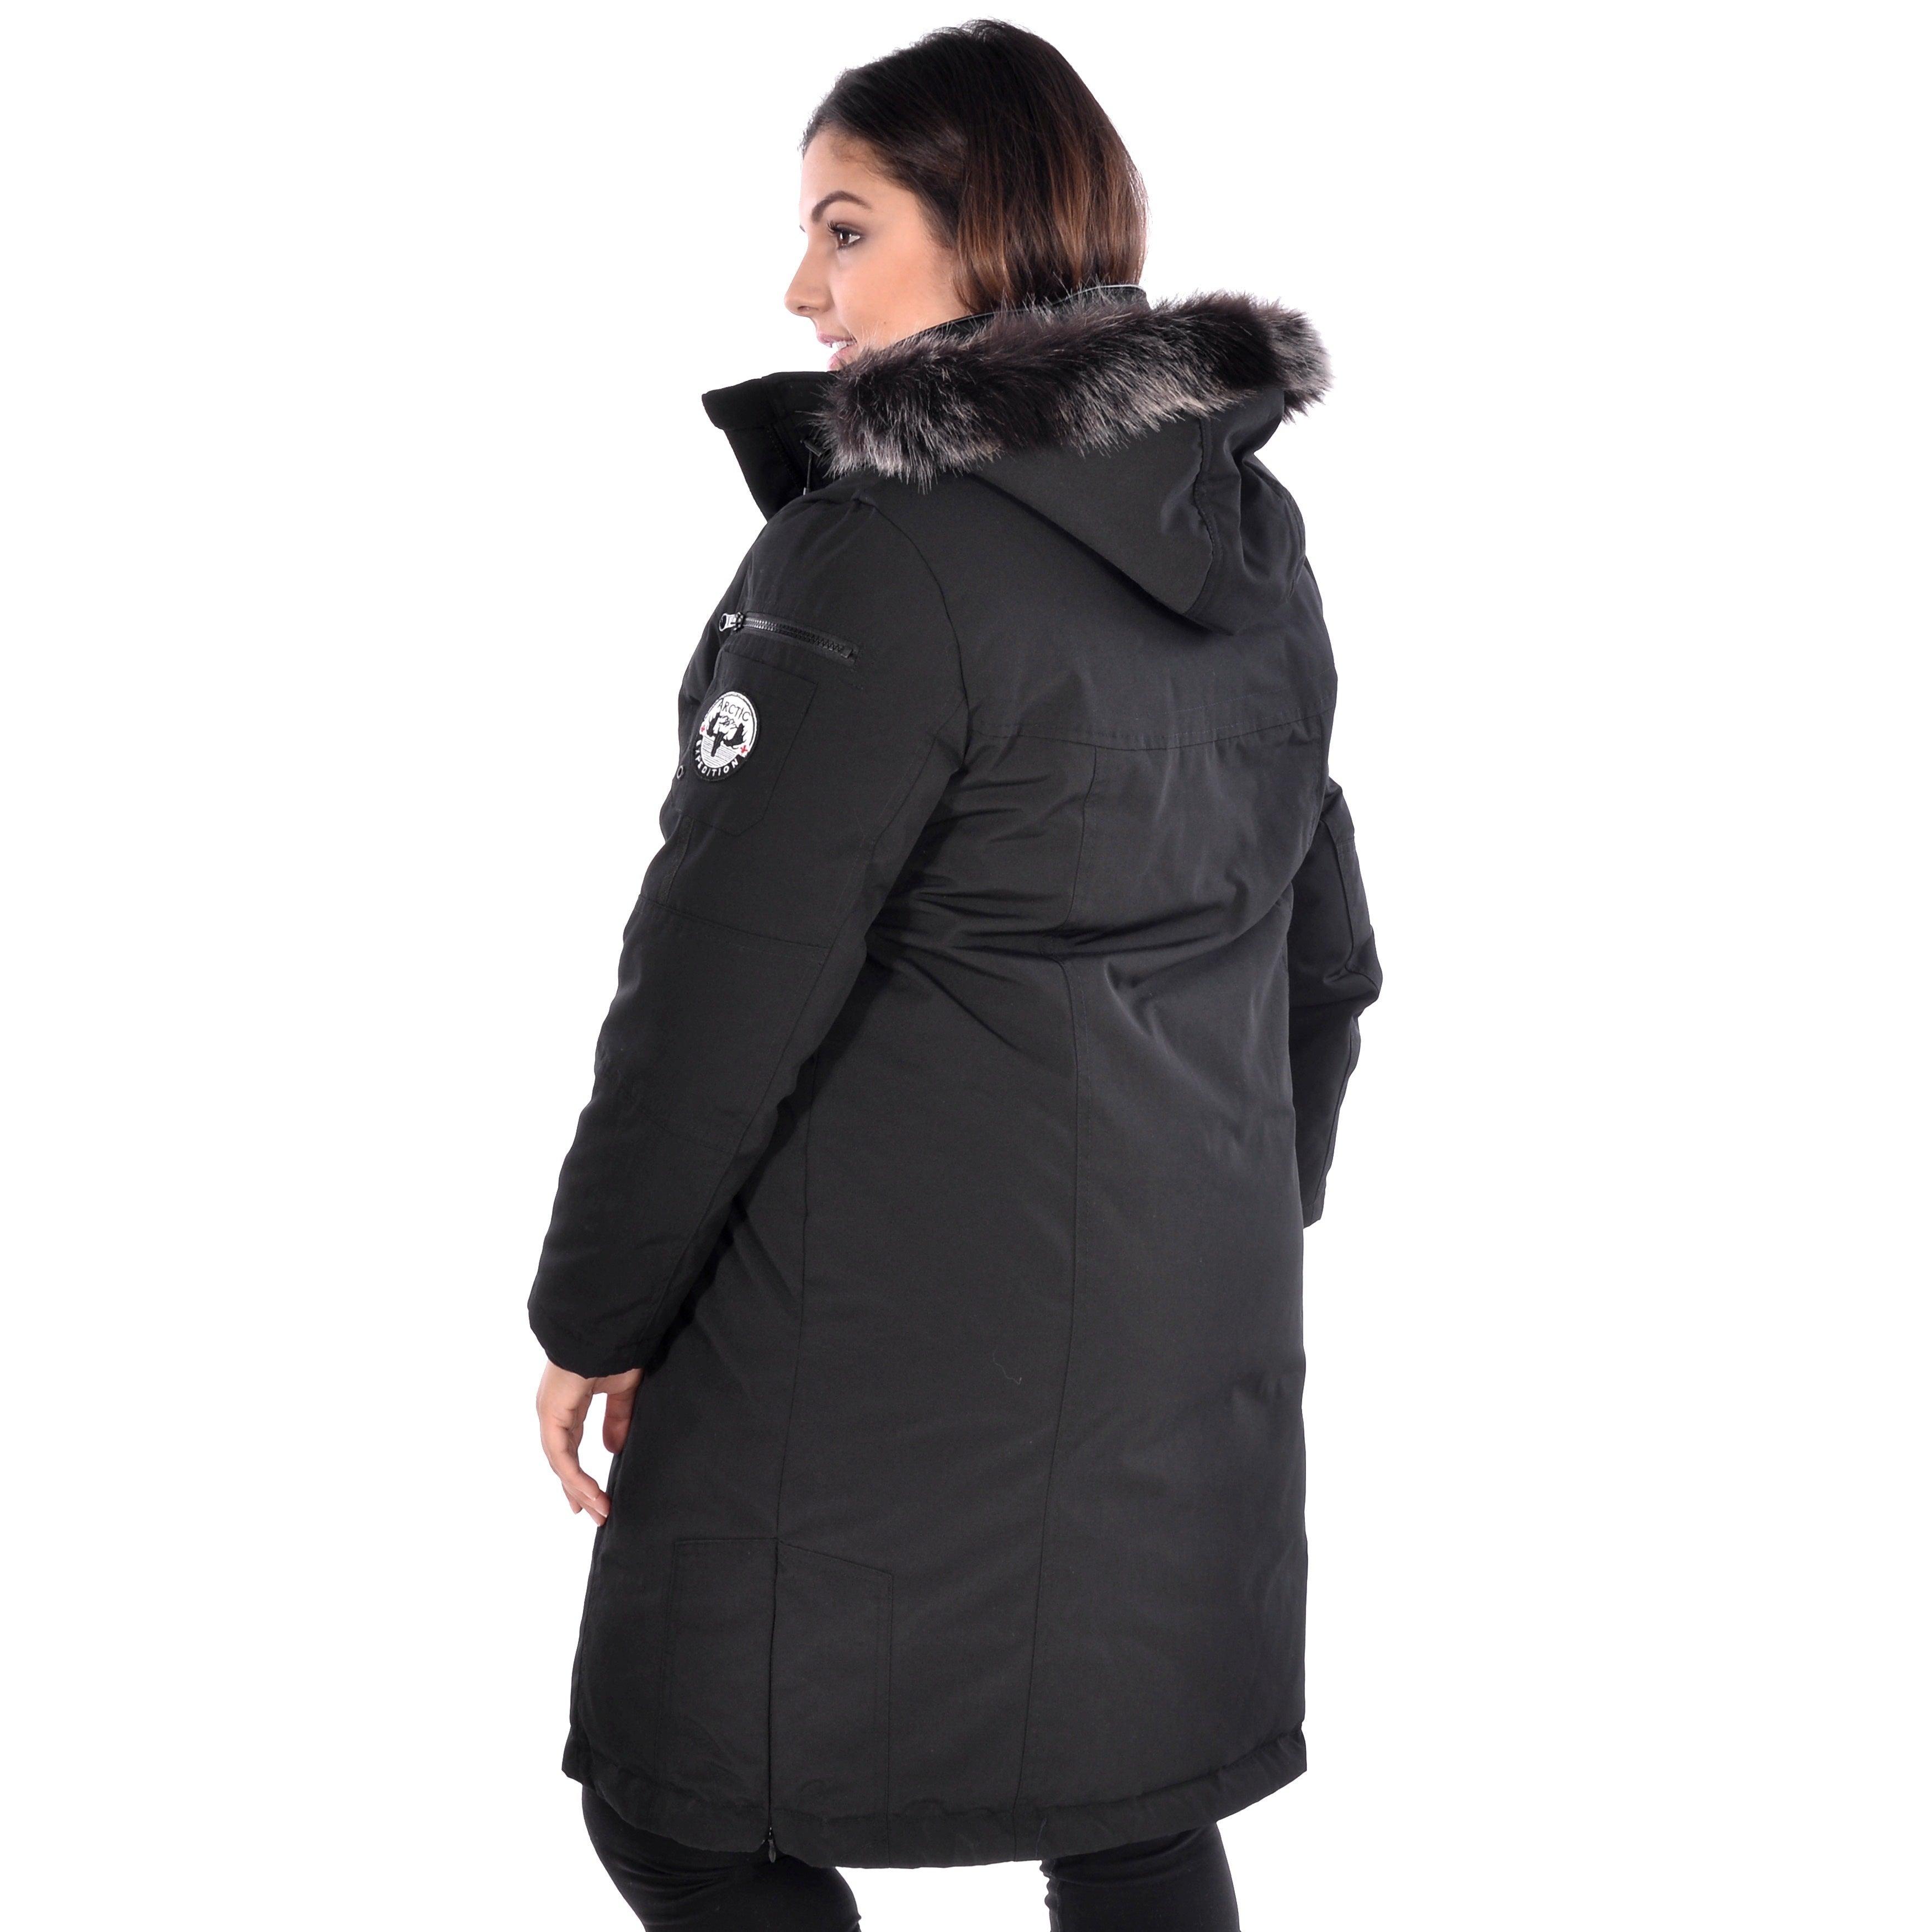 01b3246c9b9 Shop Women s Plus Size Down Coat - Free Shipping Today - Overstock ...